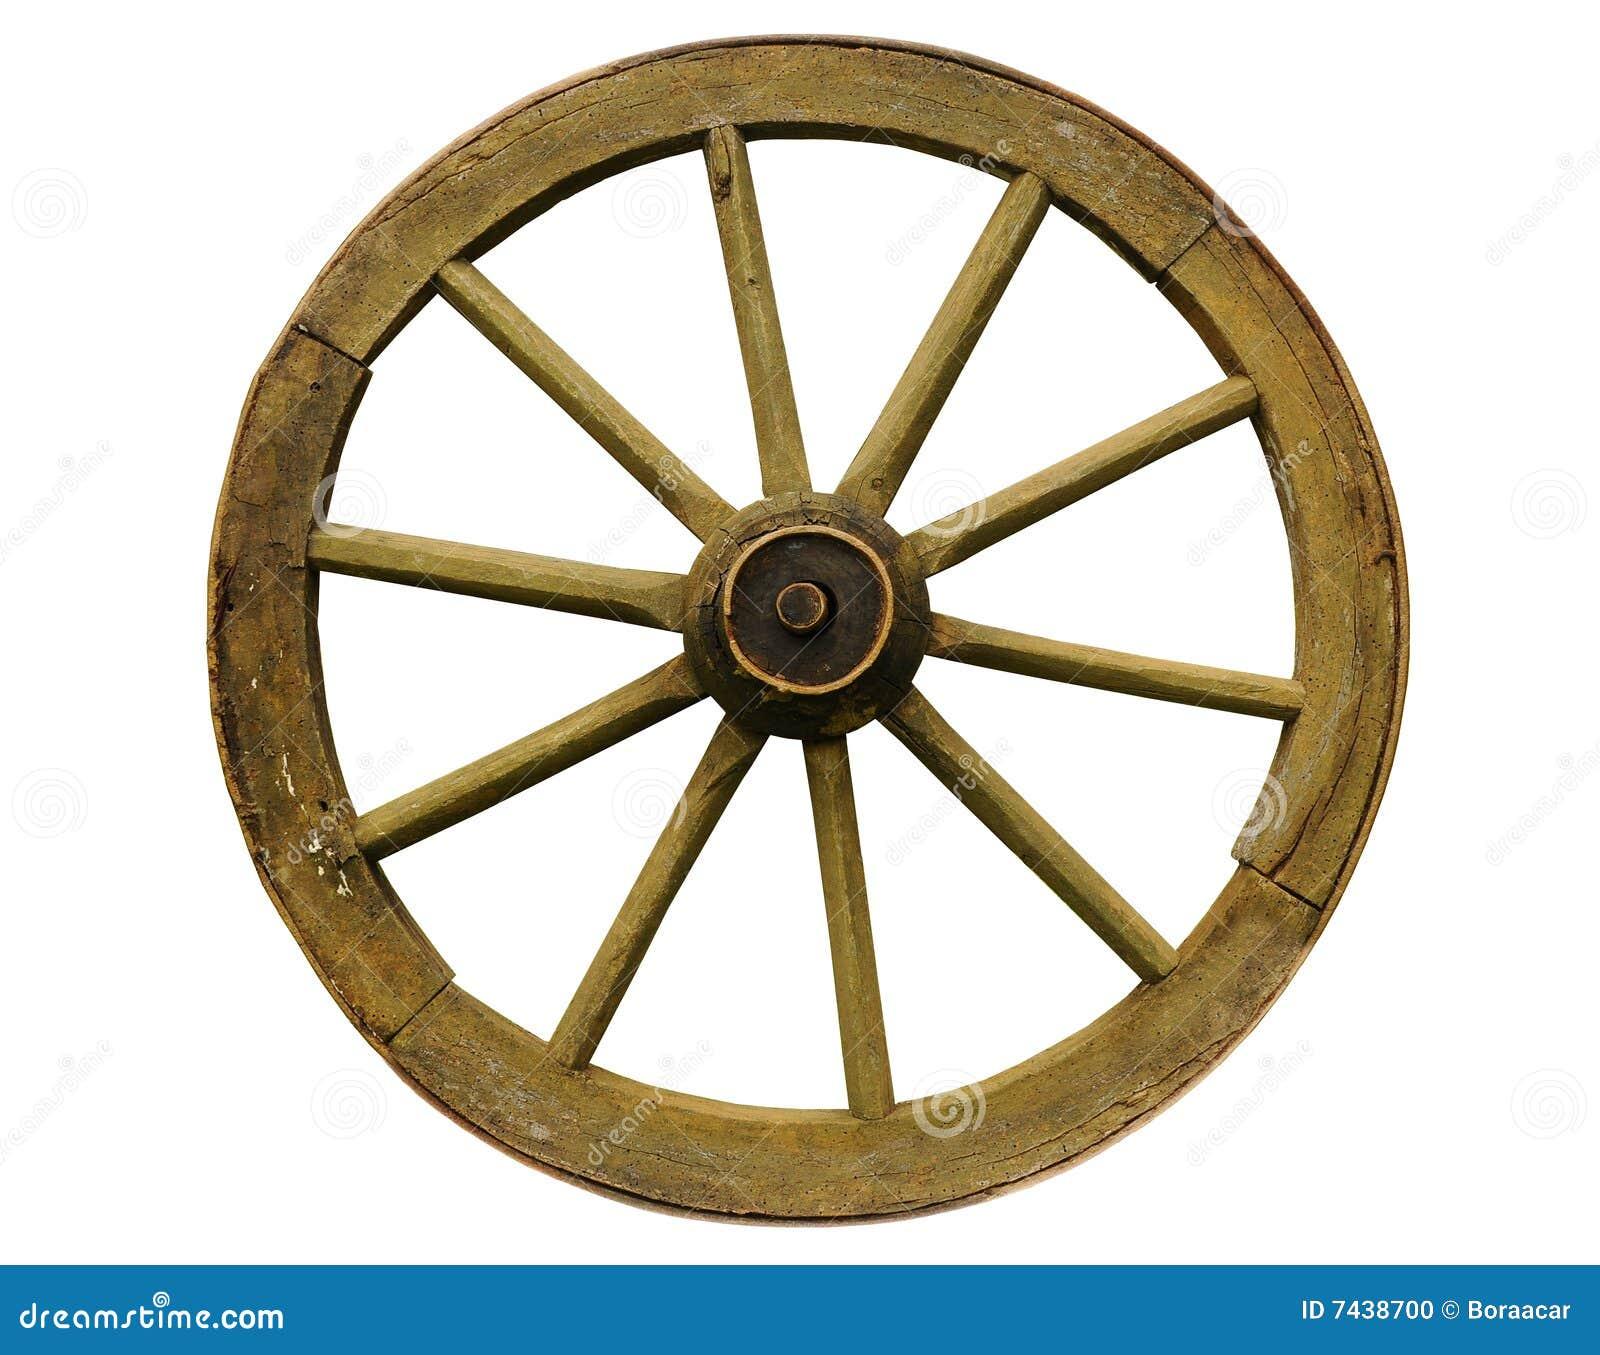 Old wagon wheel. wooden horse cart wheel.